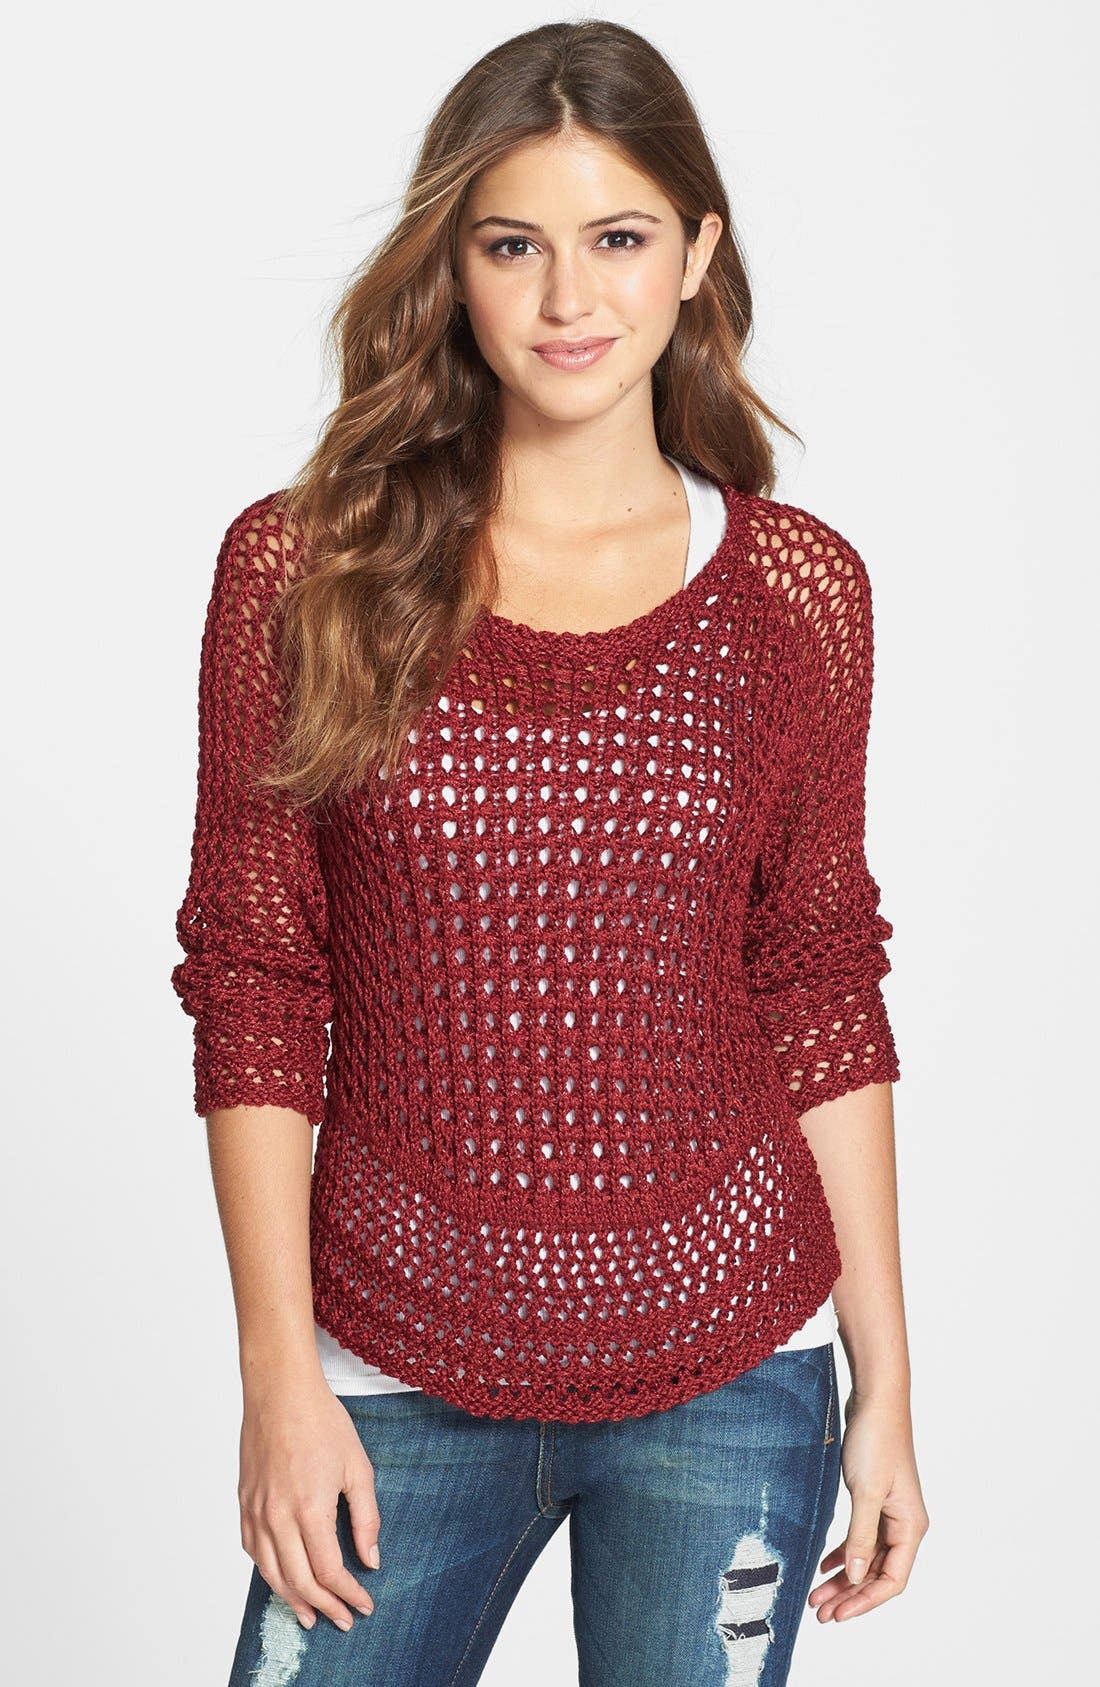 Alternate Image 1 Selected - Lucky Brand 'Marissa' Metallic Sweater